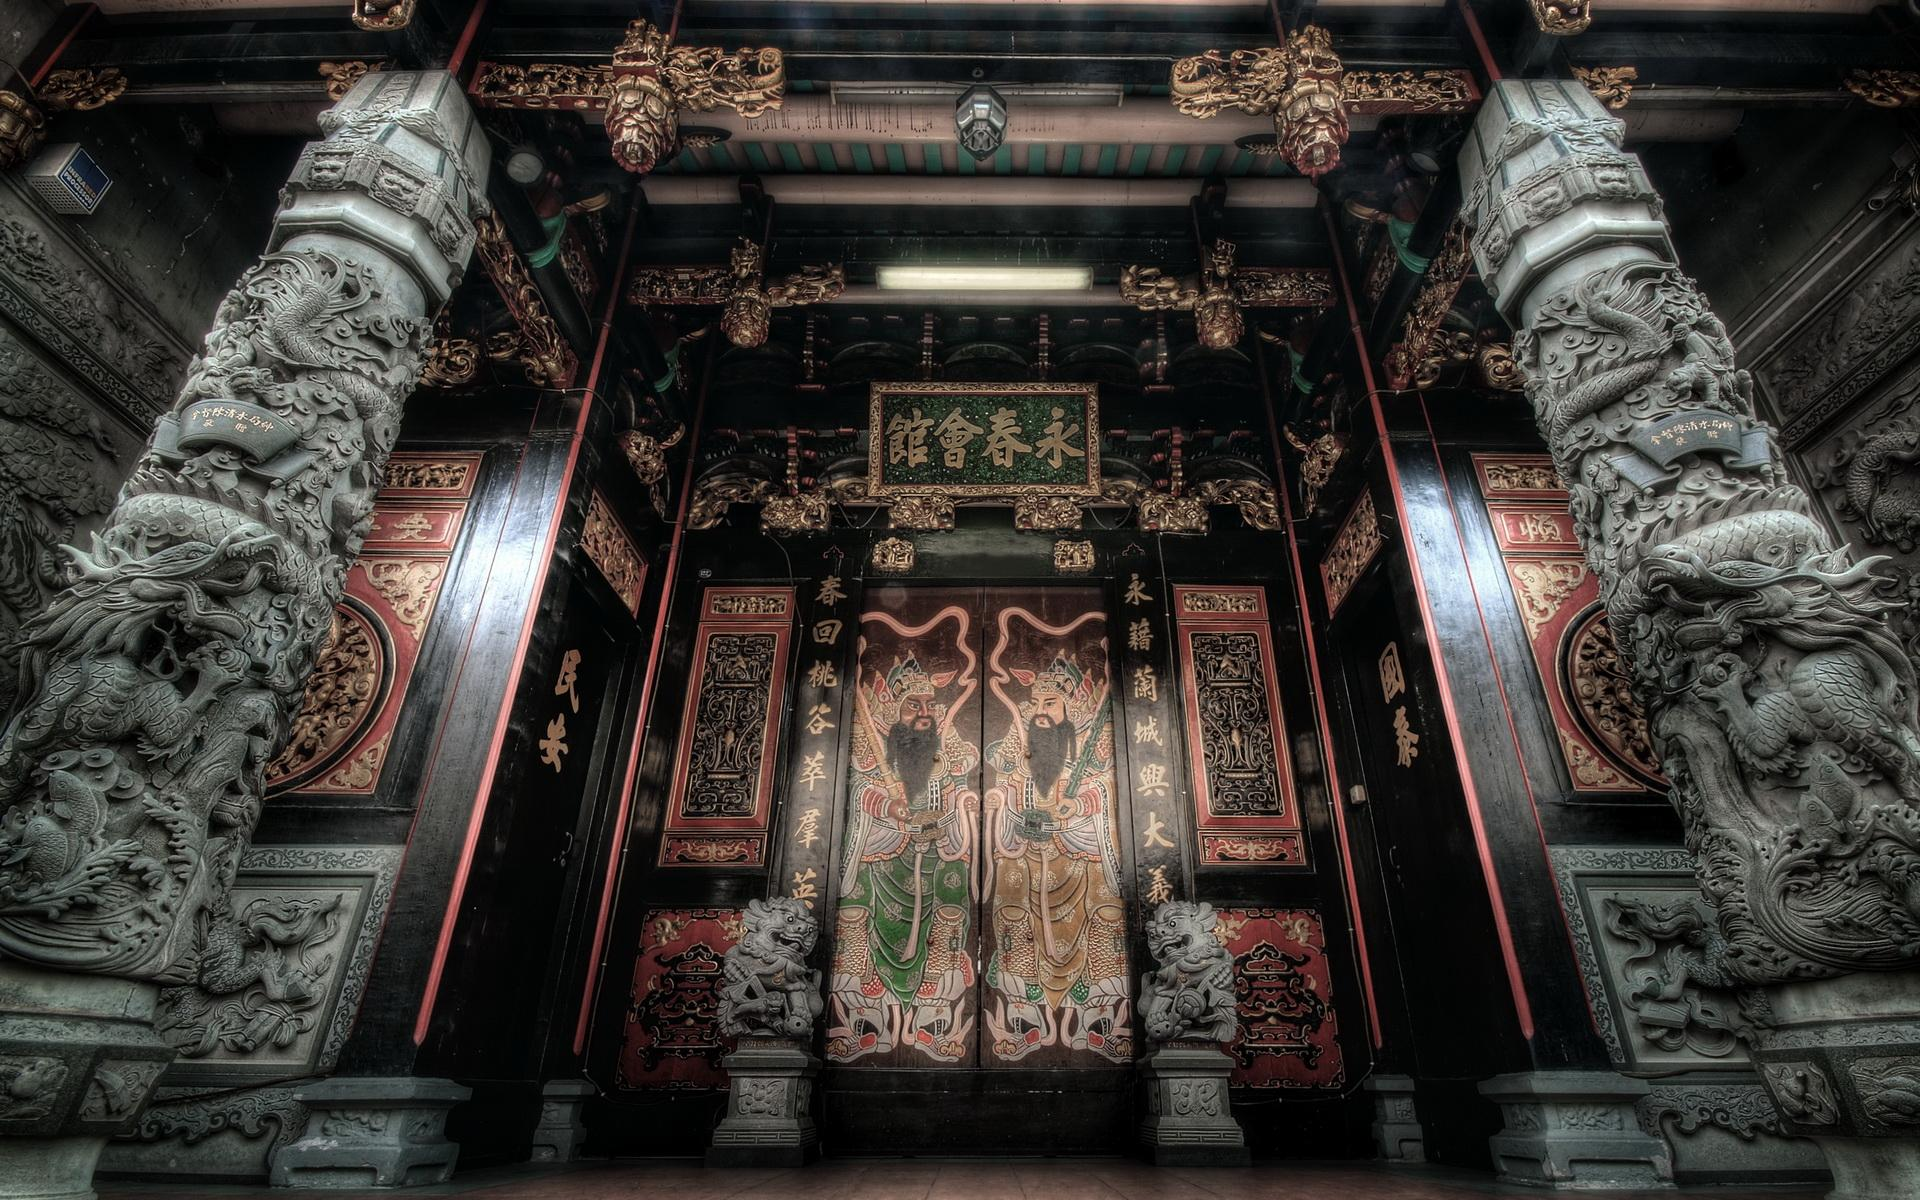 Magnificent Temple Wallpaper 42649 1920x1200 px